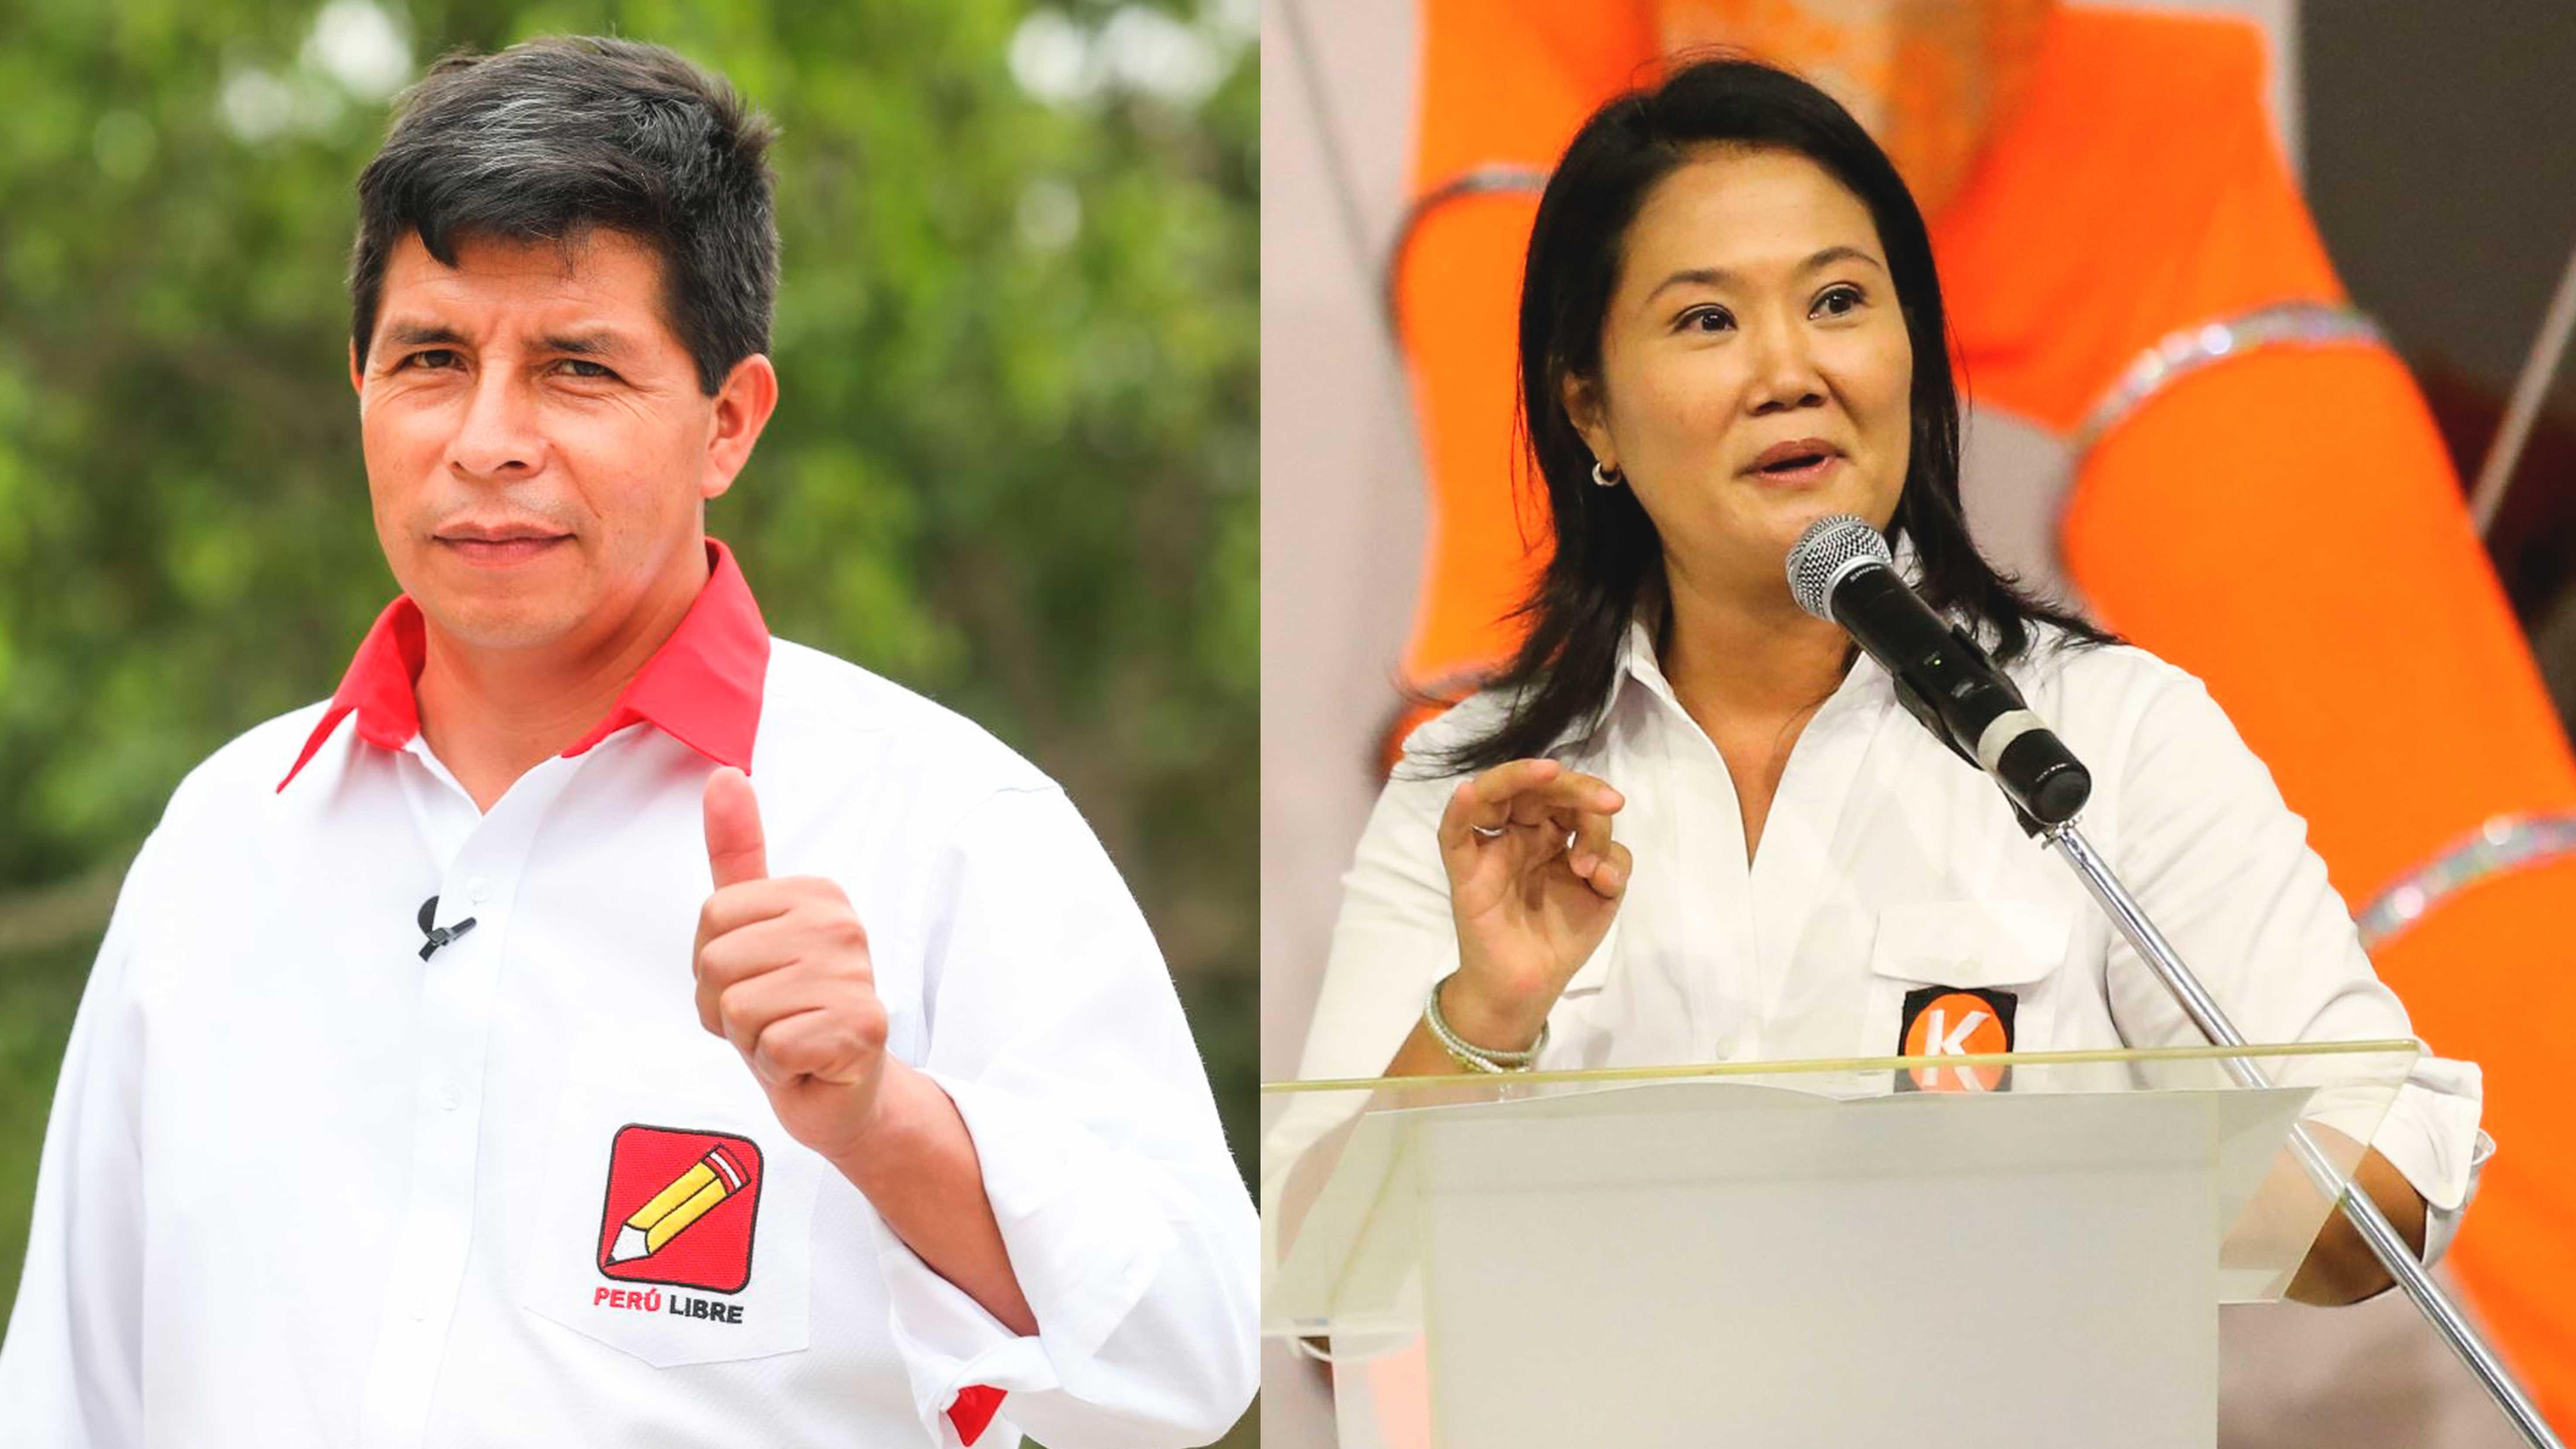 <p>Elecciones 2021: Pedro Castillo disputará la segunda vuelta contra Keiko Fujimori</p>